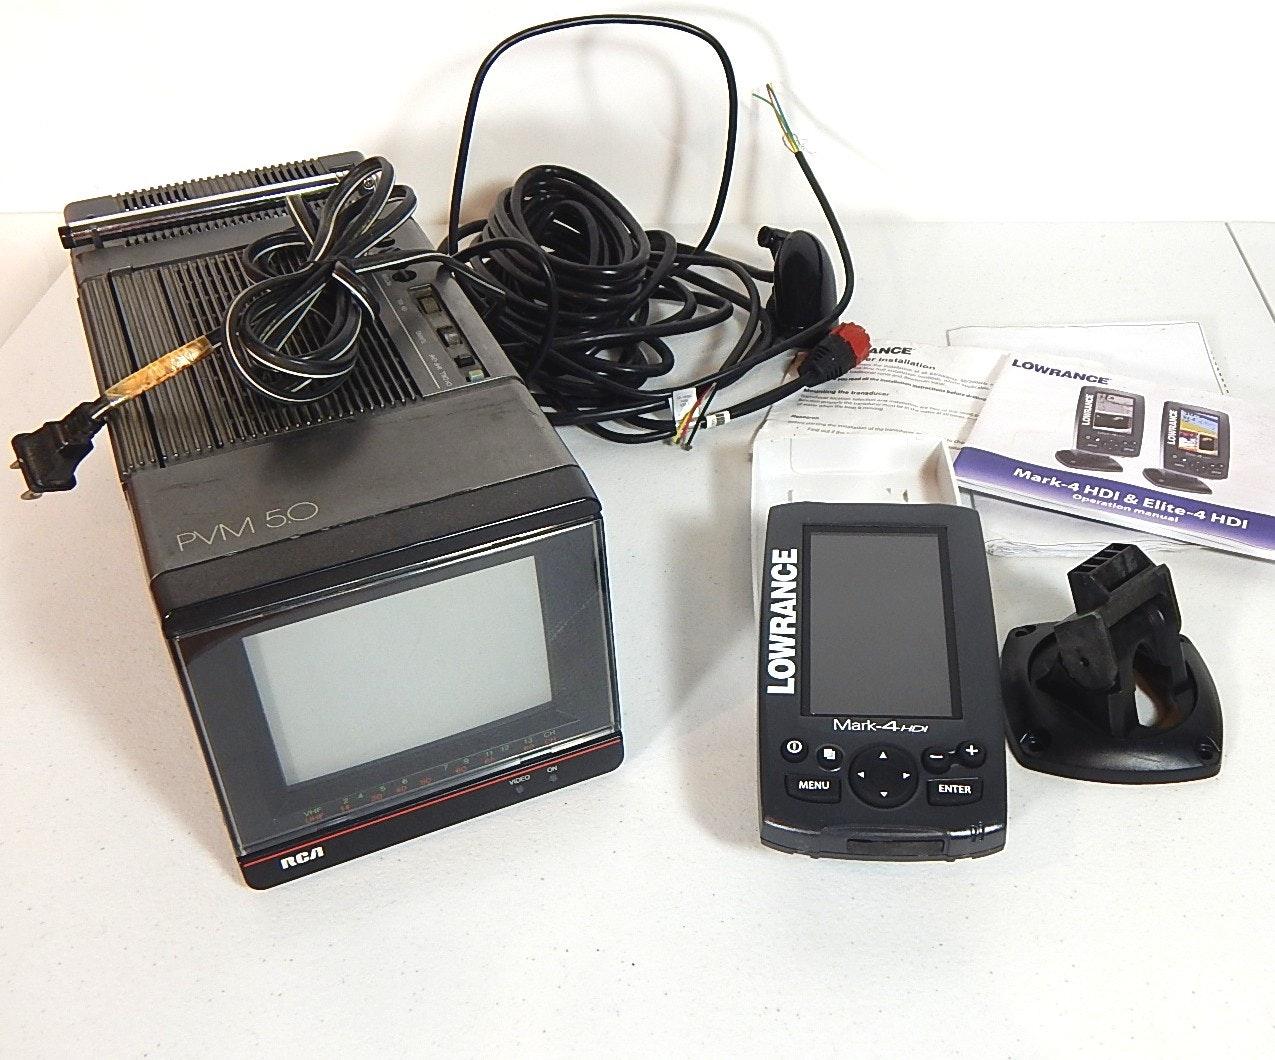 Lowrance Mark-4 HDI Fishing Sonar and RCA PVM 5.0 Monitor